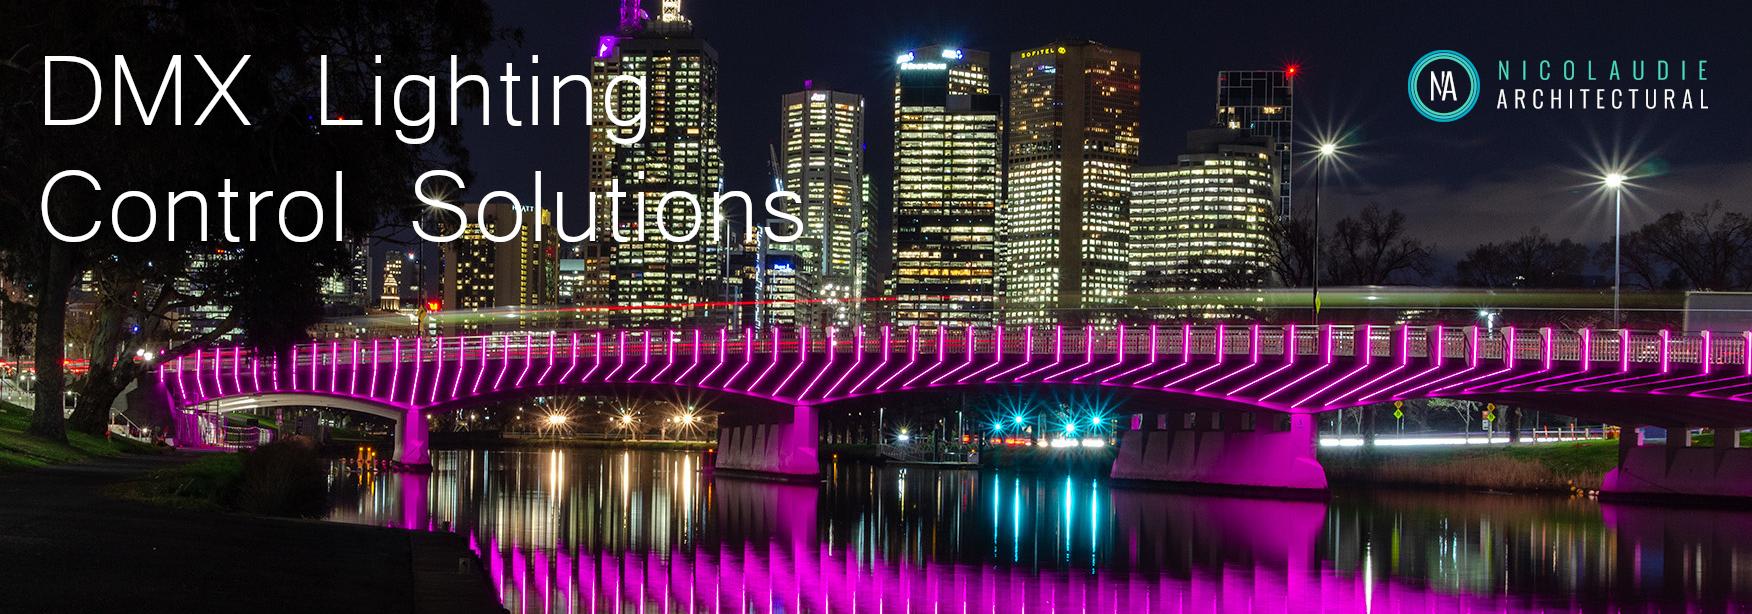 Nicolaudie - DMX Lighting Control Solutions